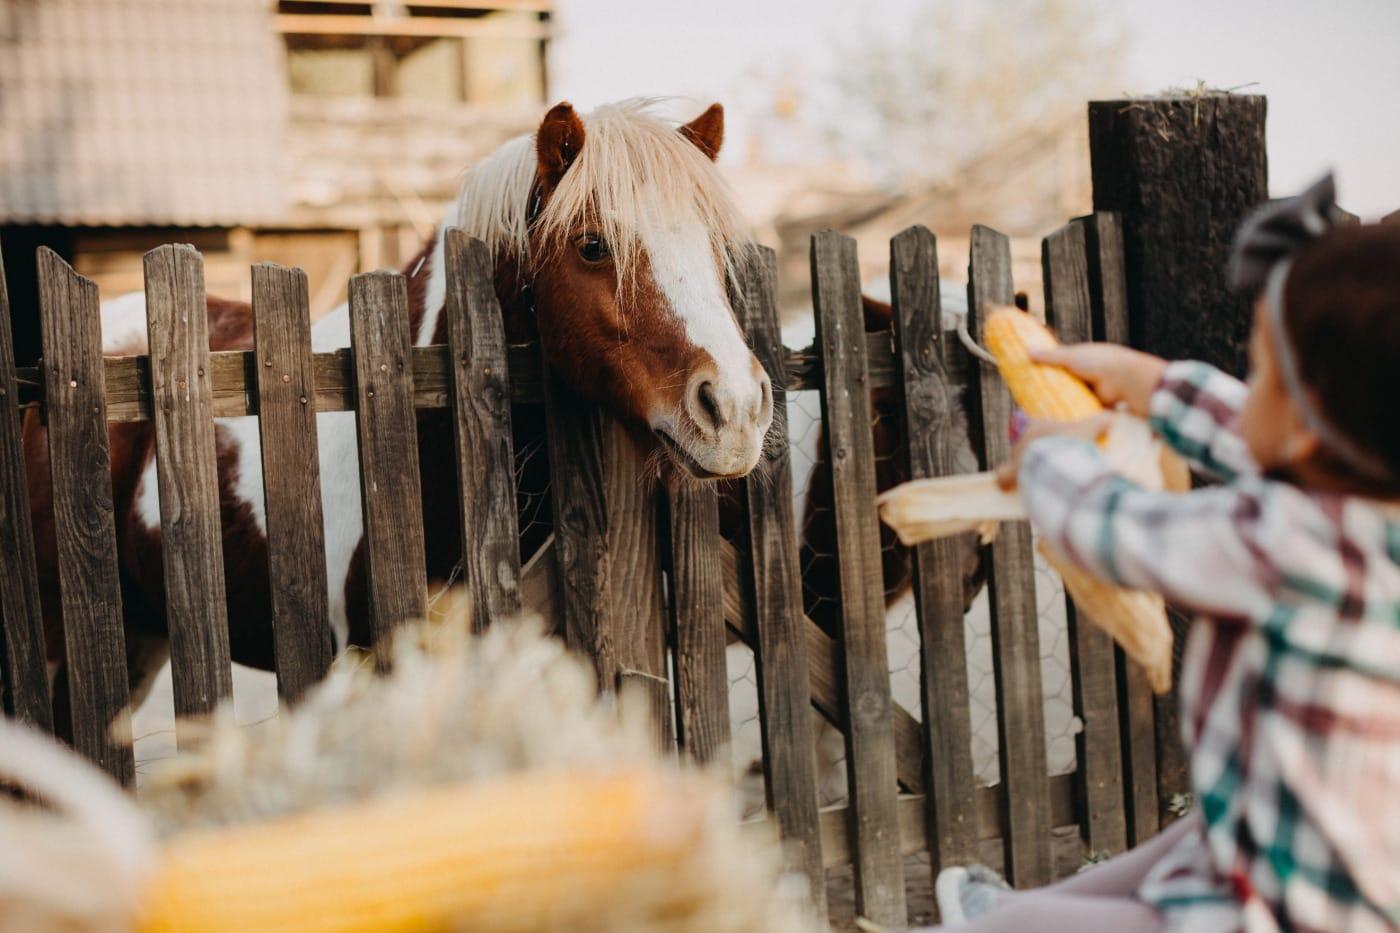 pony, paard, dorp, platteland, hek, voeding, kind, maïs, diervoeders, eten